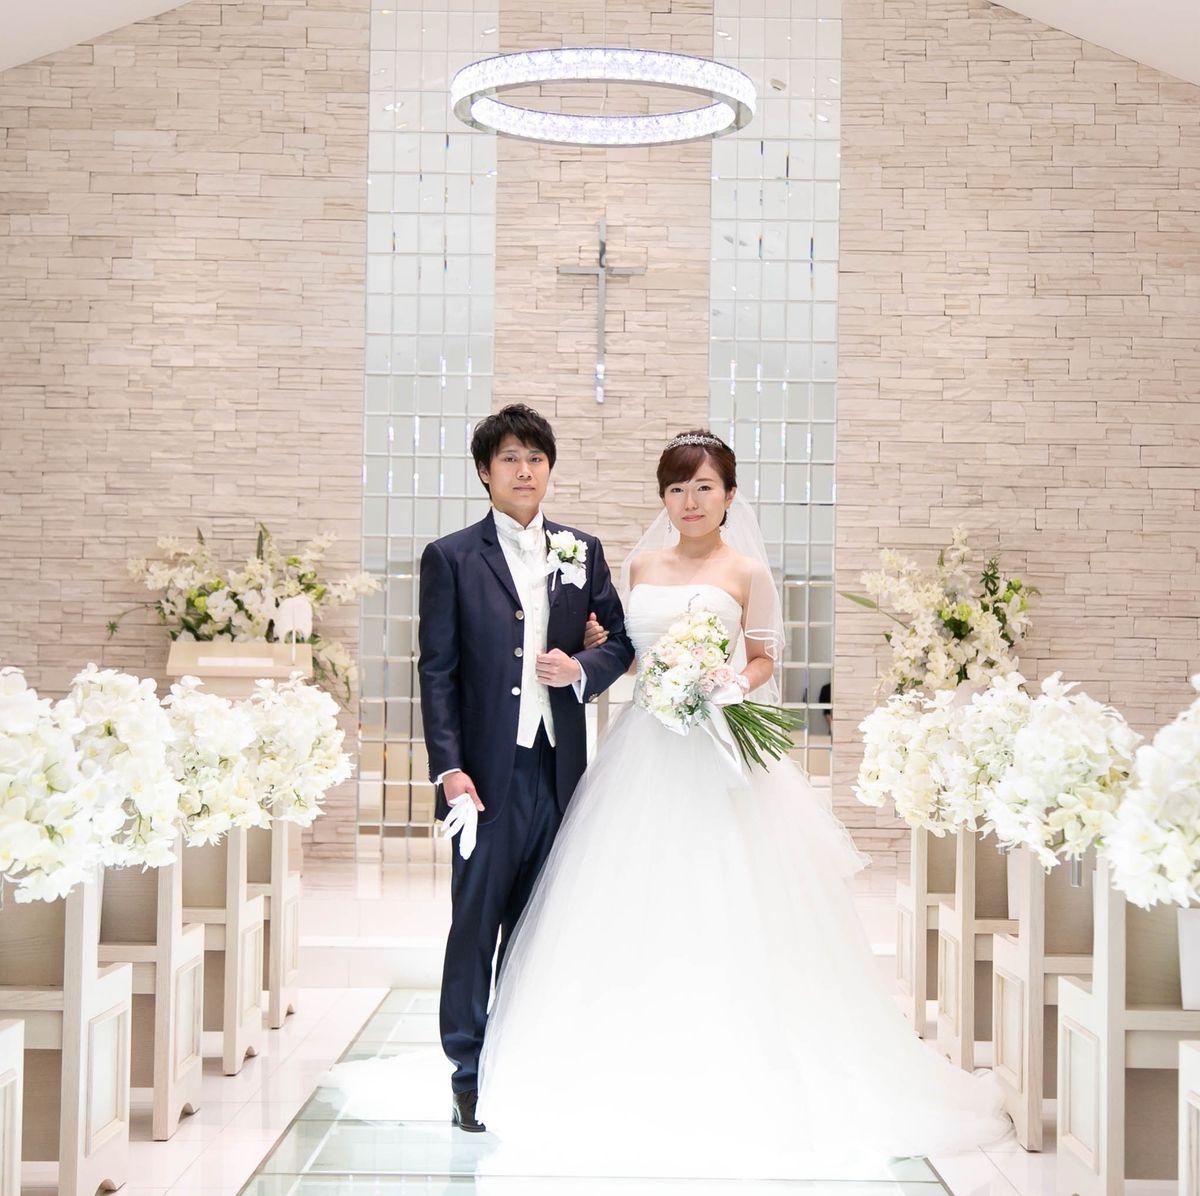 naro.weddingさんのフレアージュスウィート写真1枚目